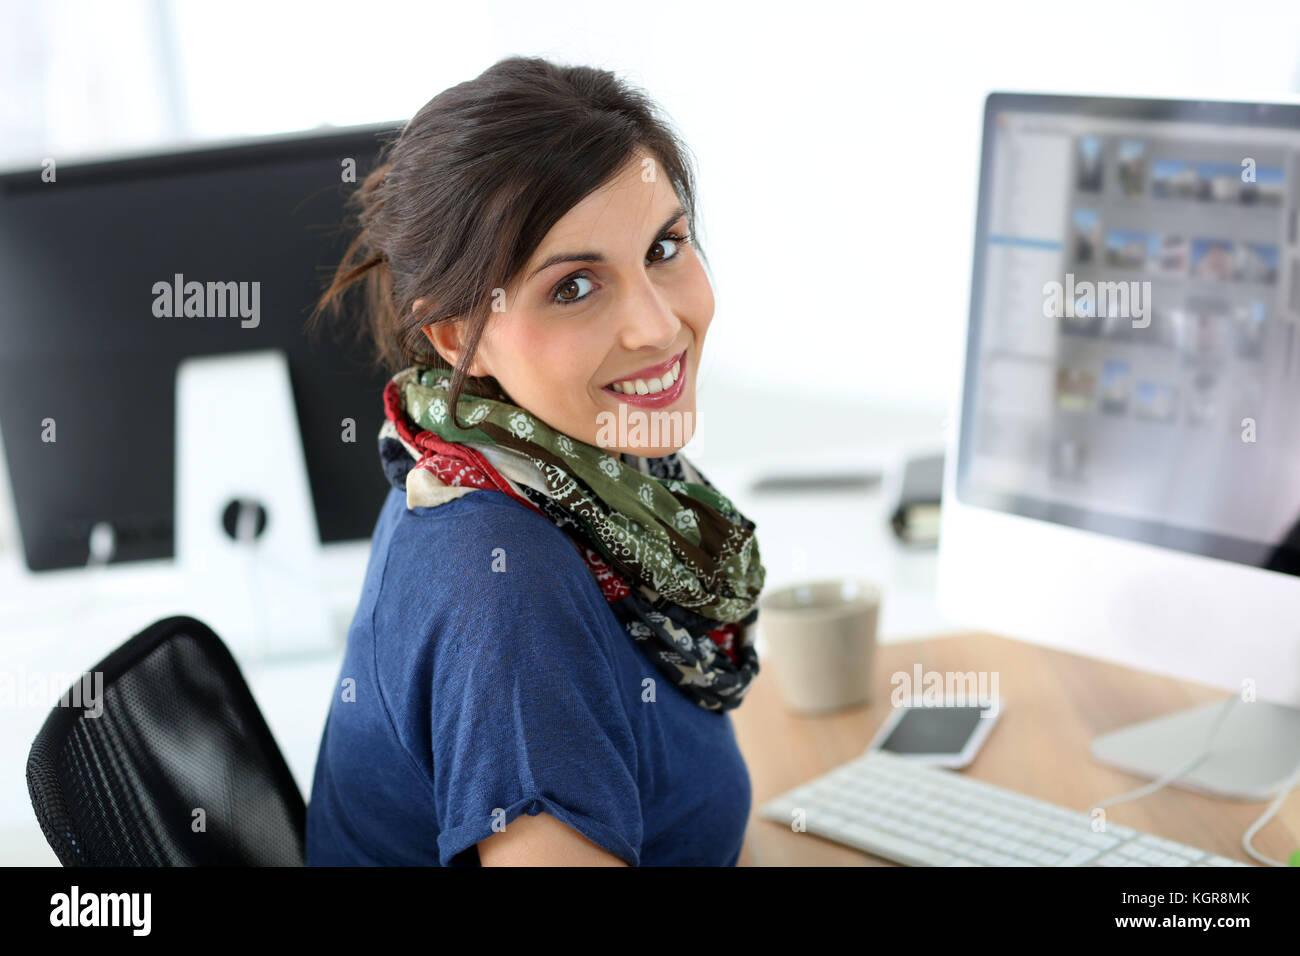 Smiling brunette Mädchen in der Ausbildung Klasse Stockbild